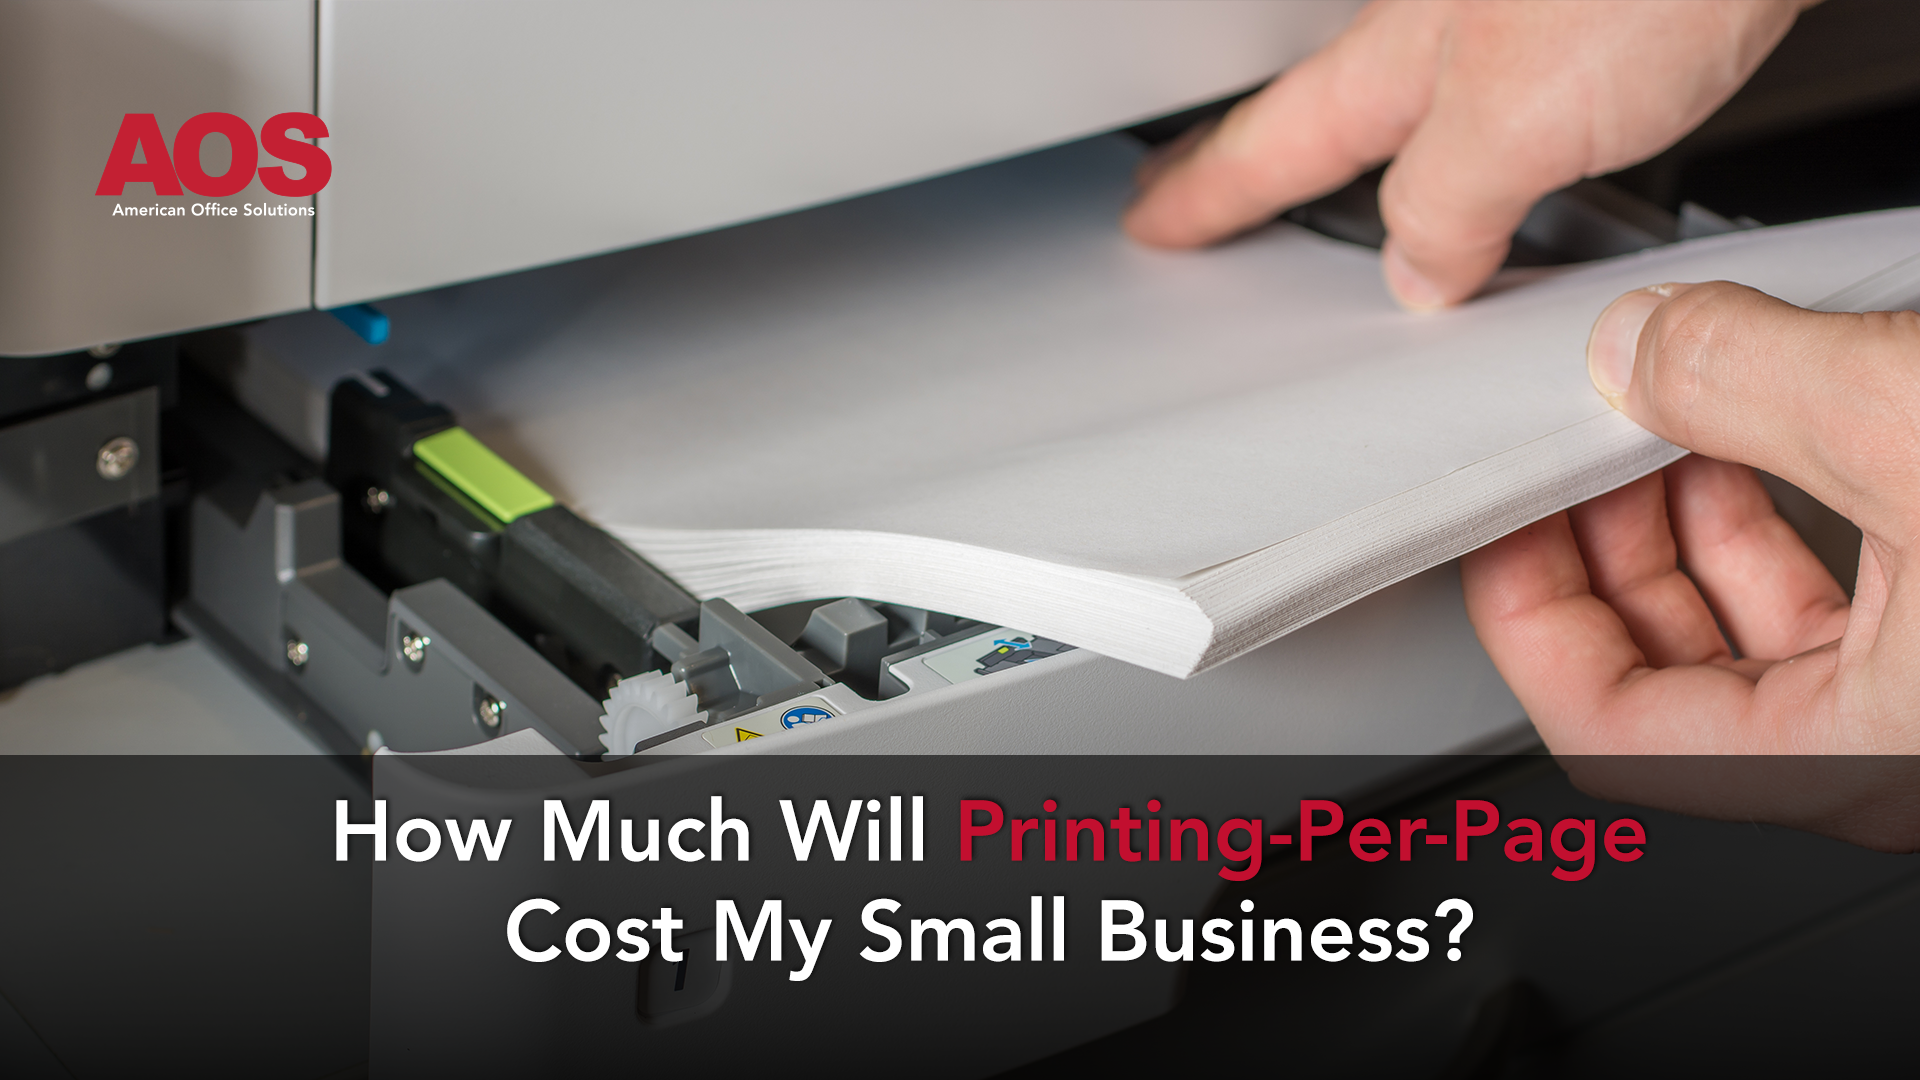 Printing Per Page